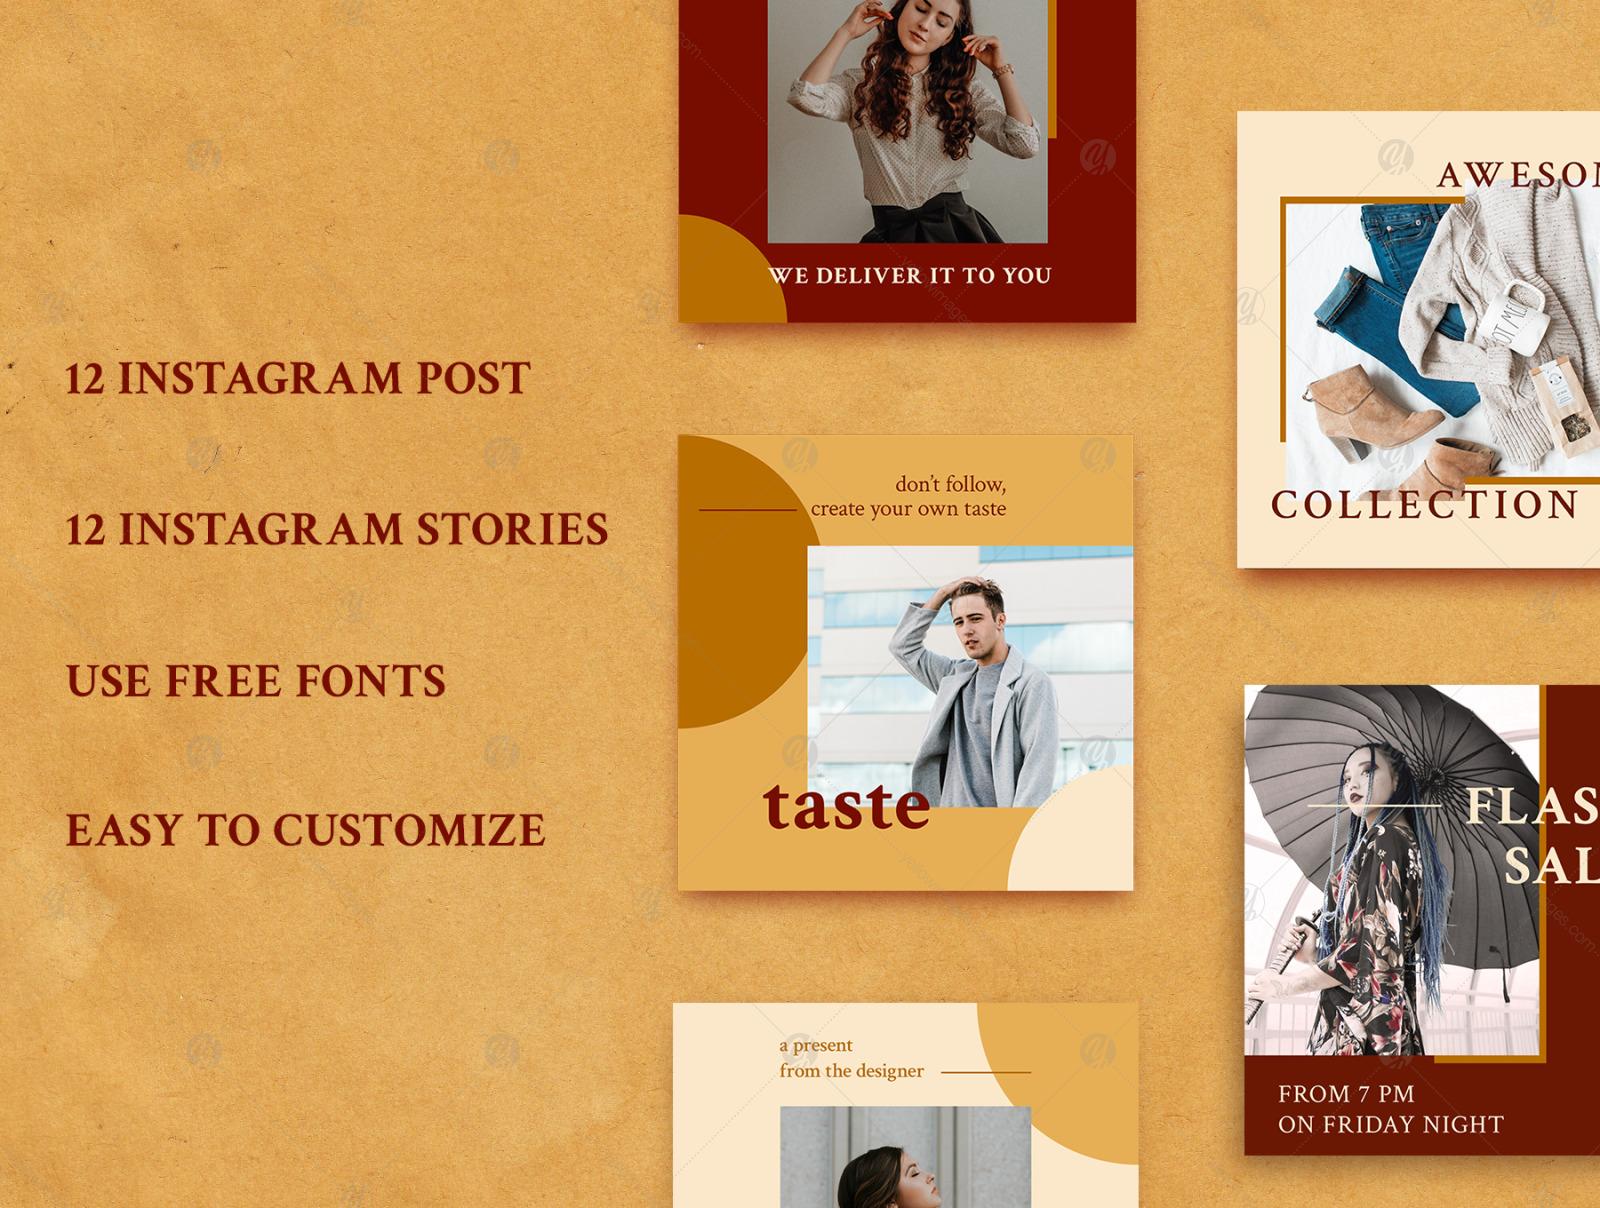 Storia - Social Media Templates for Instagram